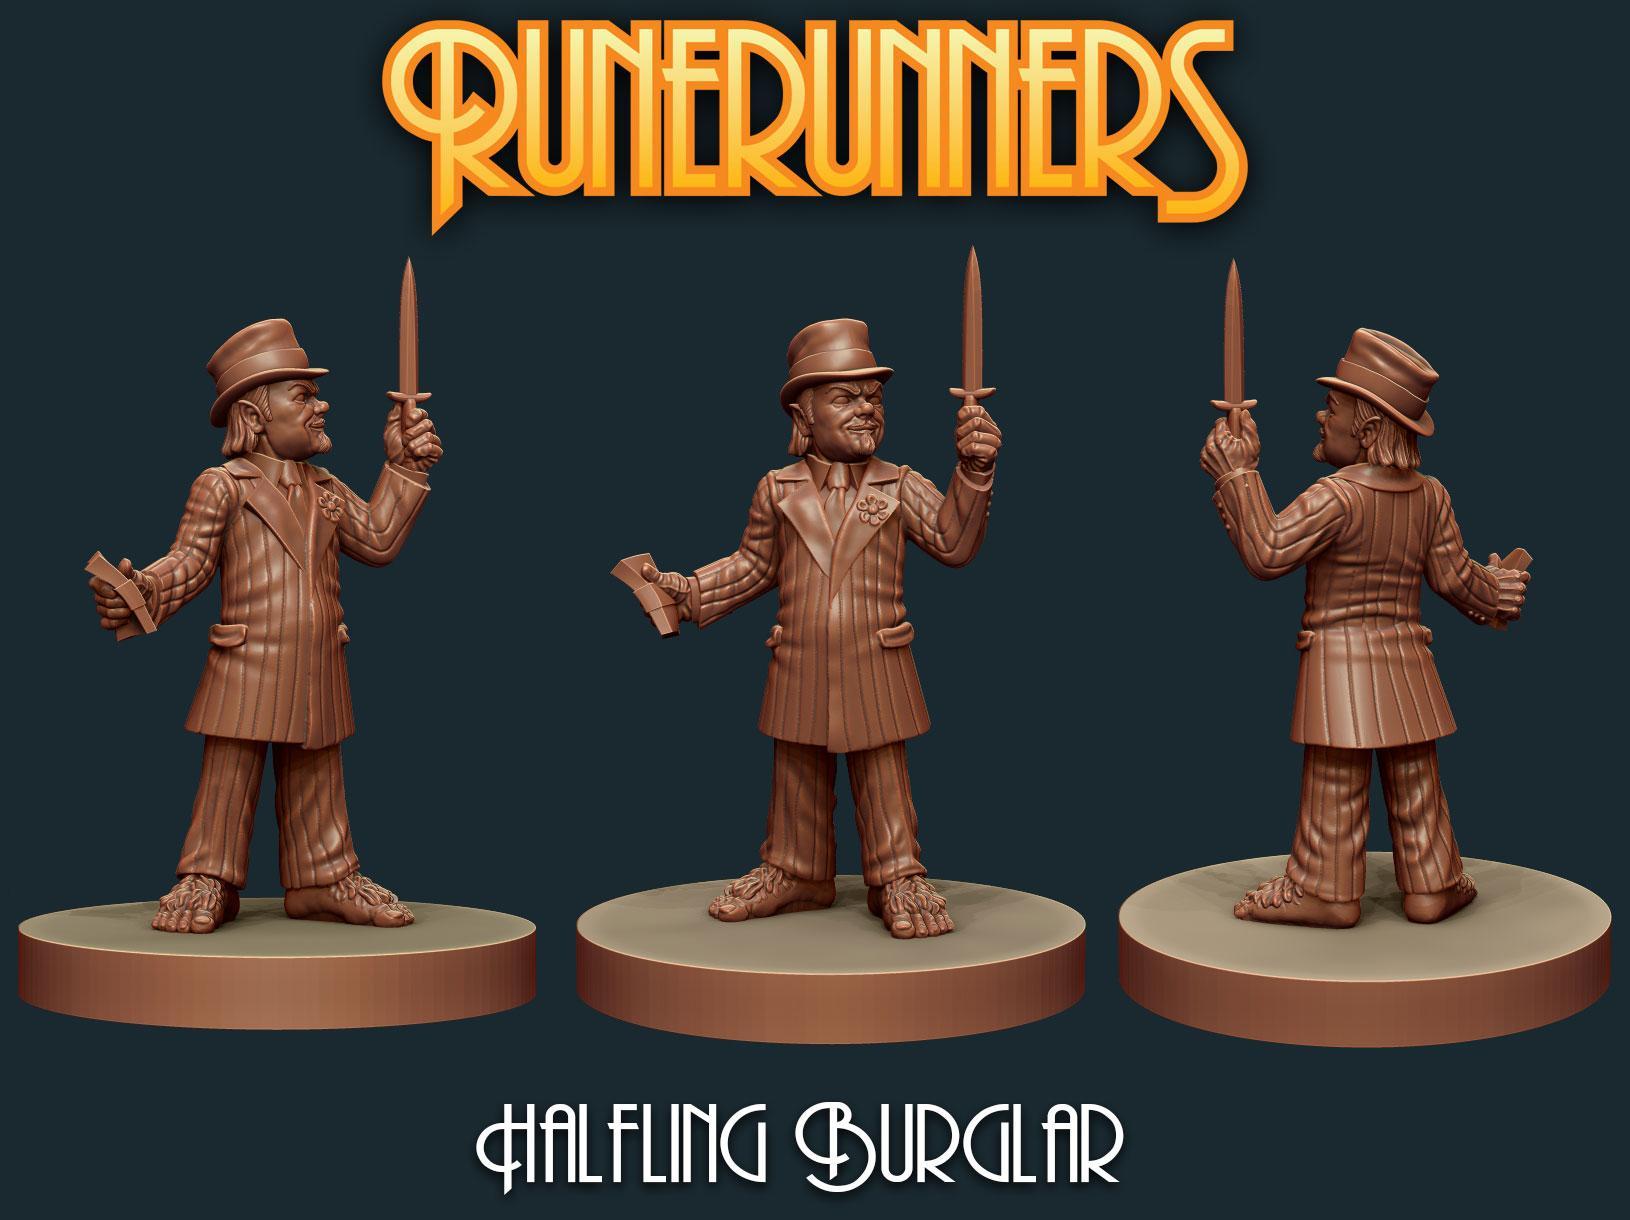 Runerunners Halfling Burglar